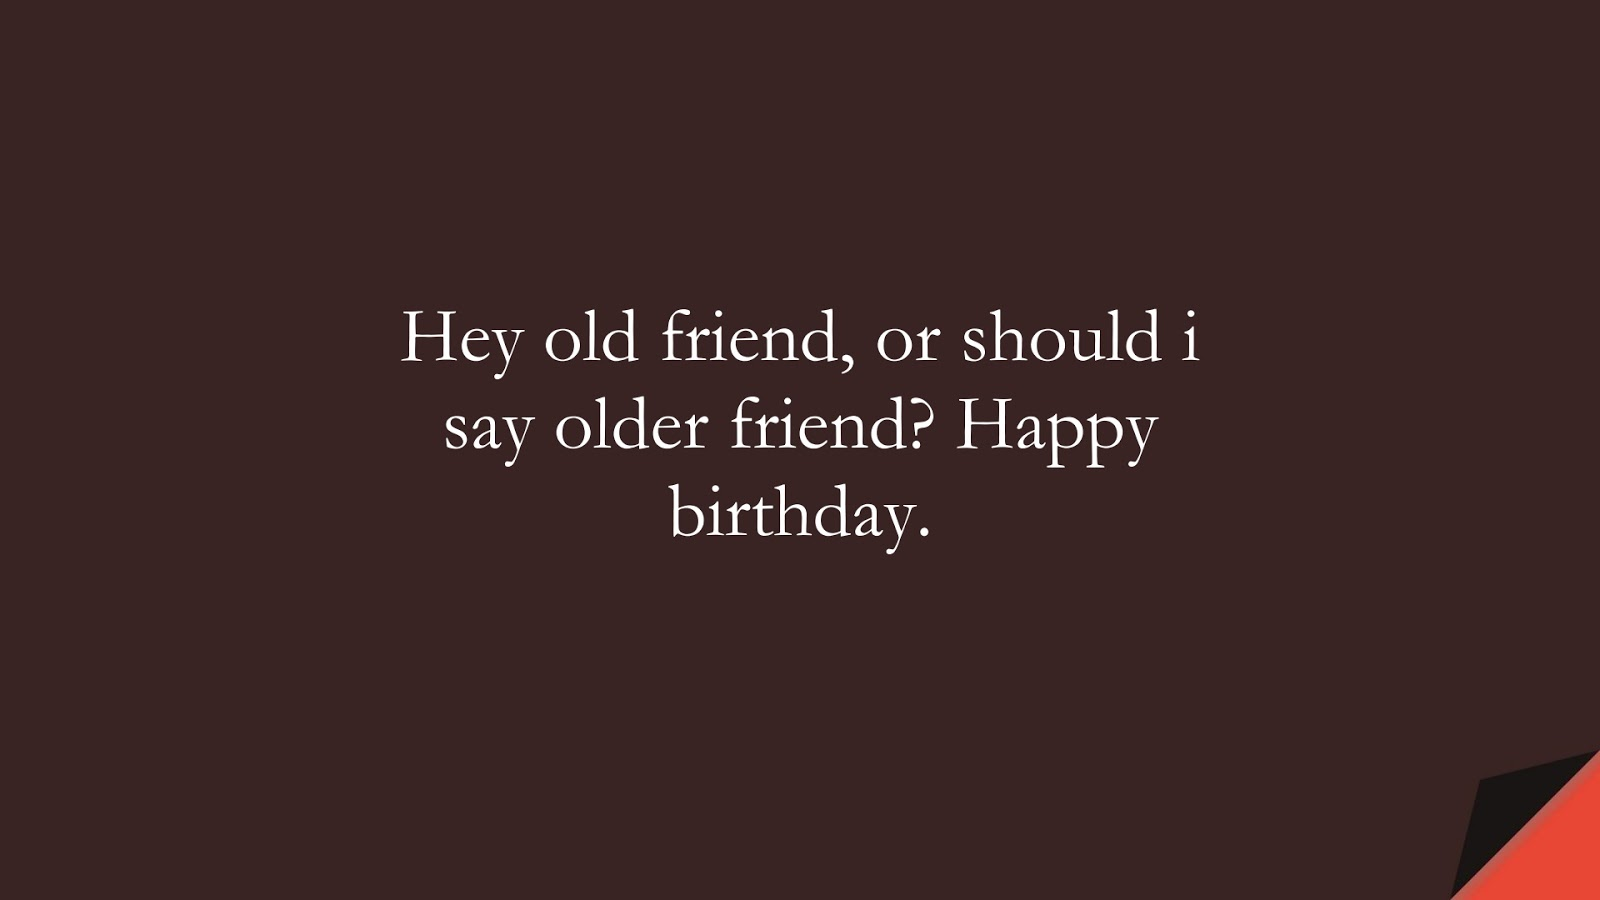 Hey old friend, or should i say older friend? Happy birthday.FALSE